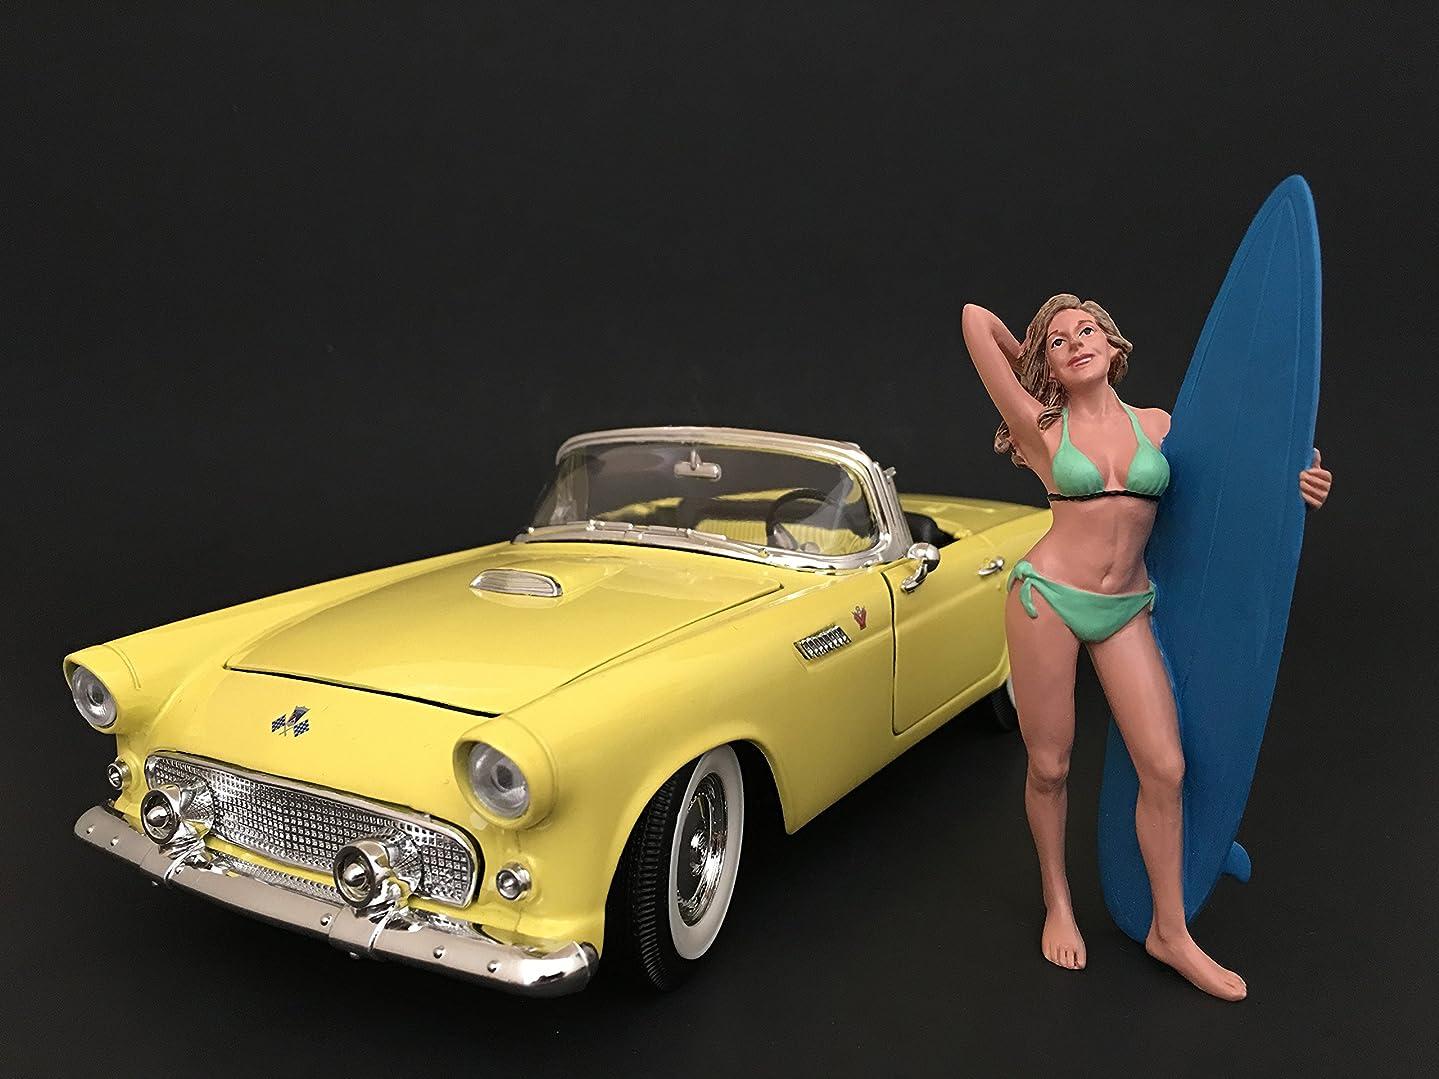 American Diorama 77440 Surfer Paris Figure For 1:18 Scale Models